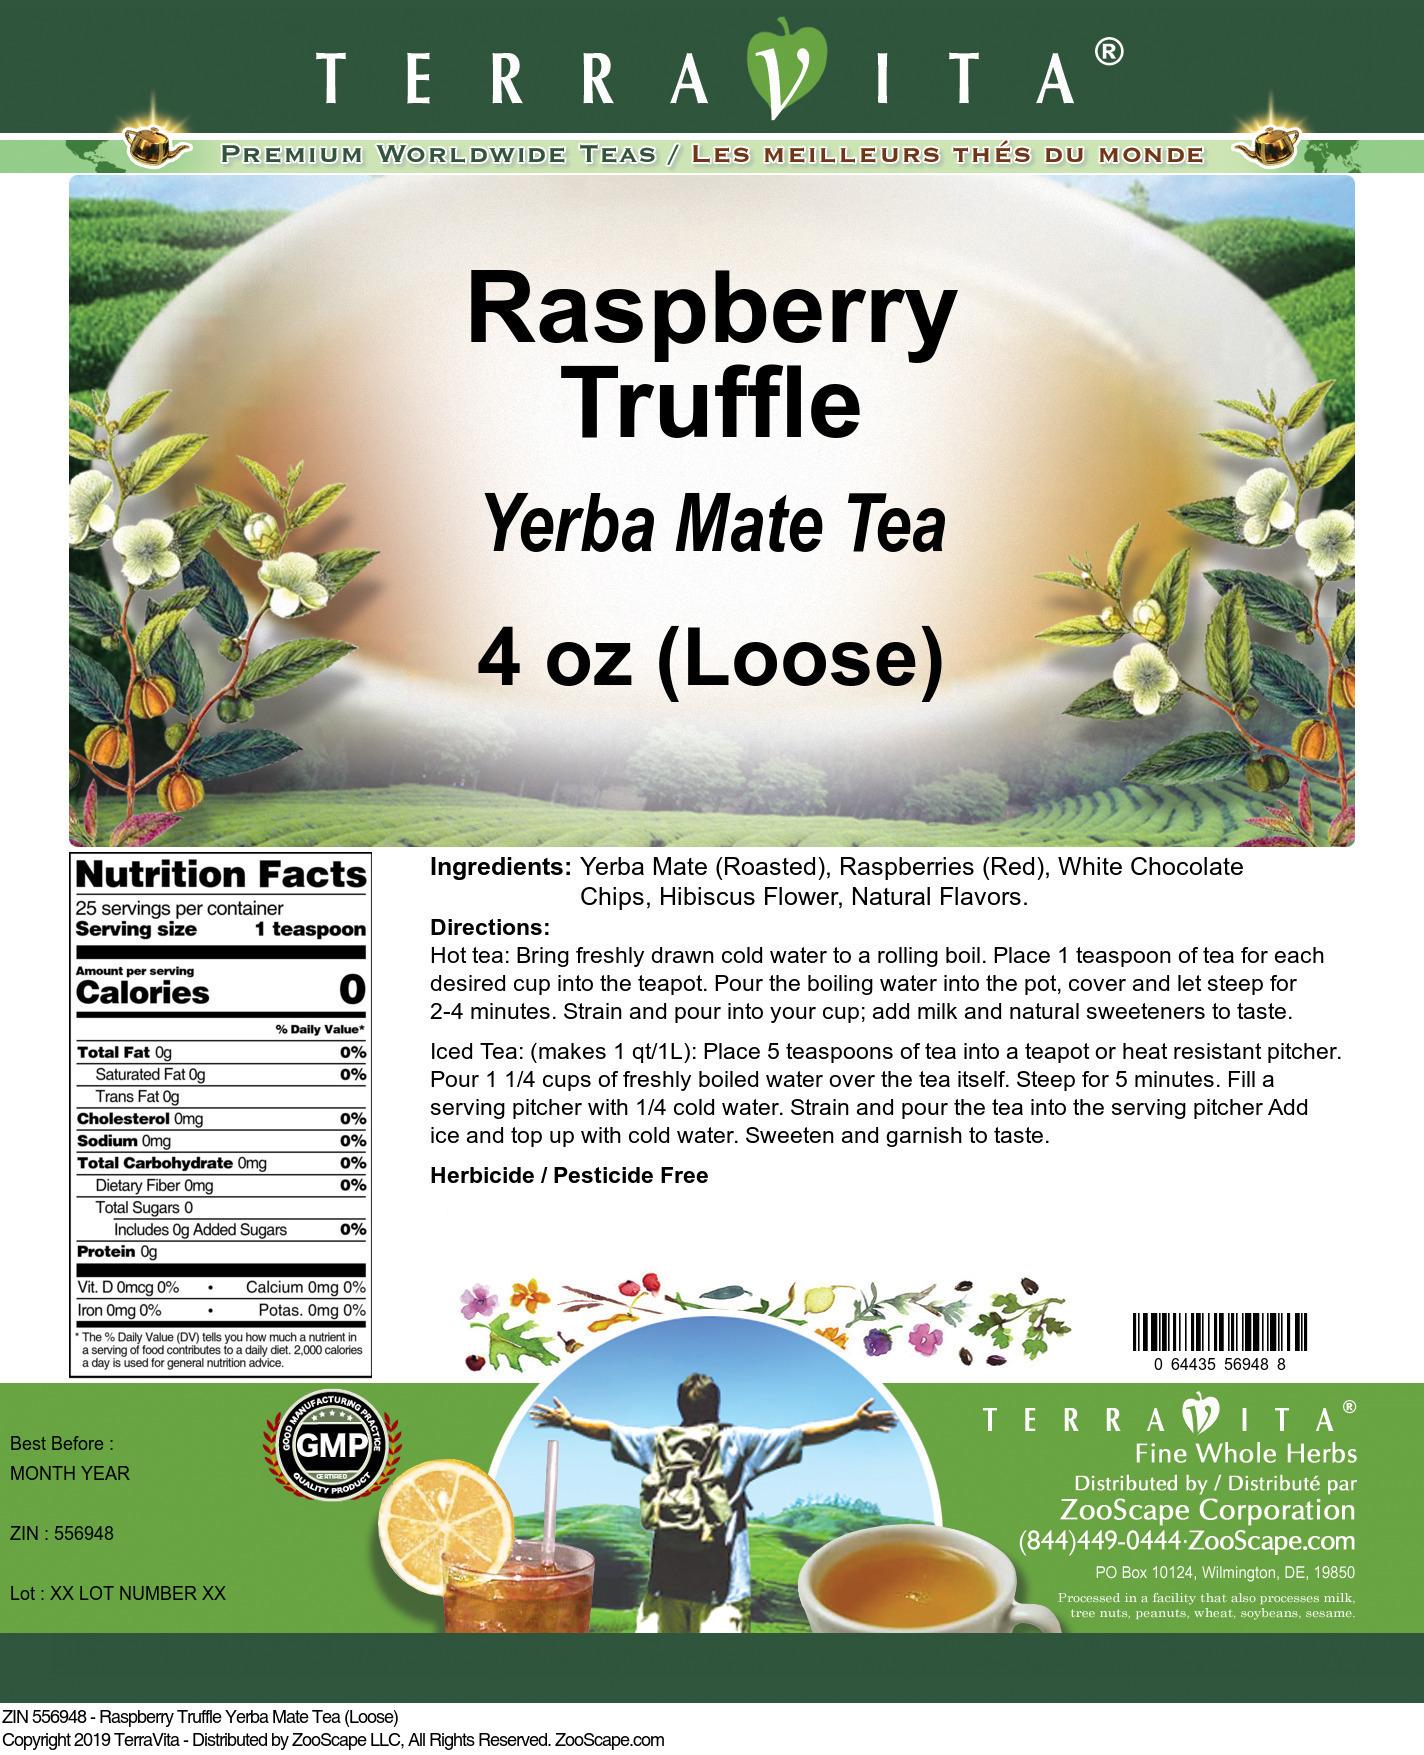 Raspberry Truffle Yerba Mate Tea (Loose)